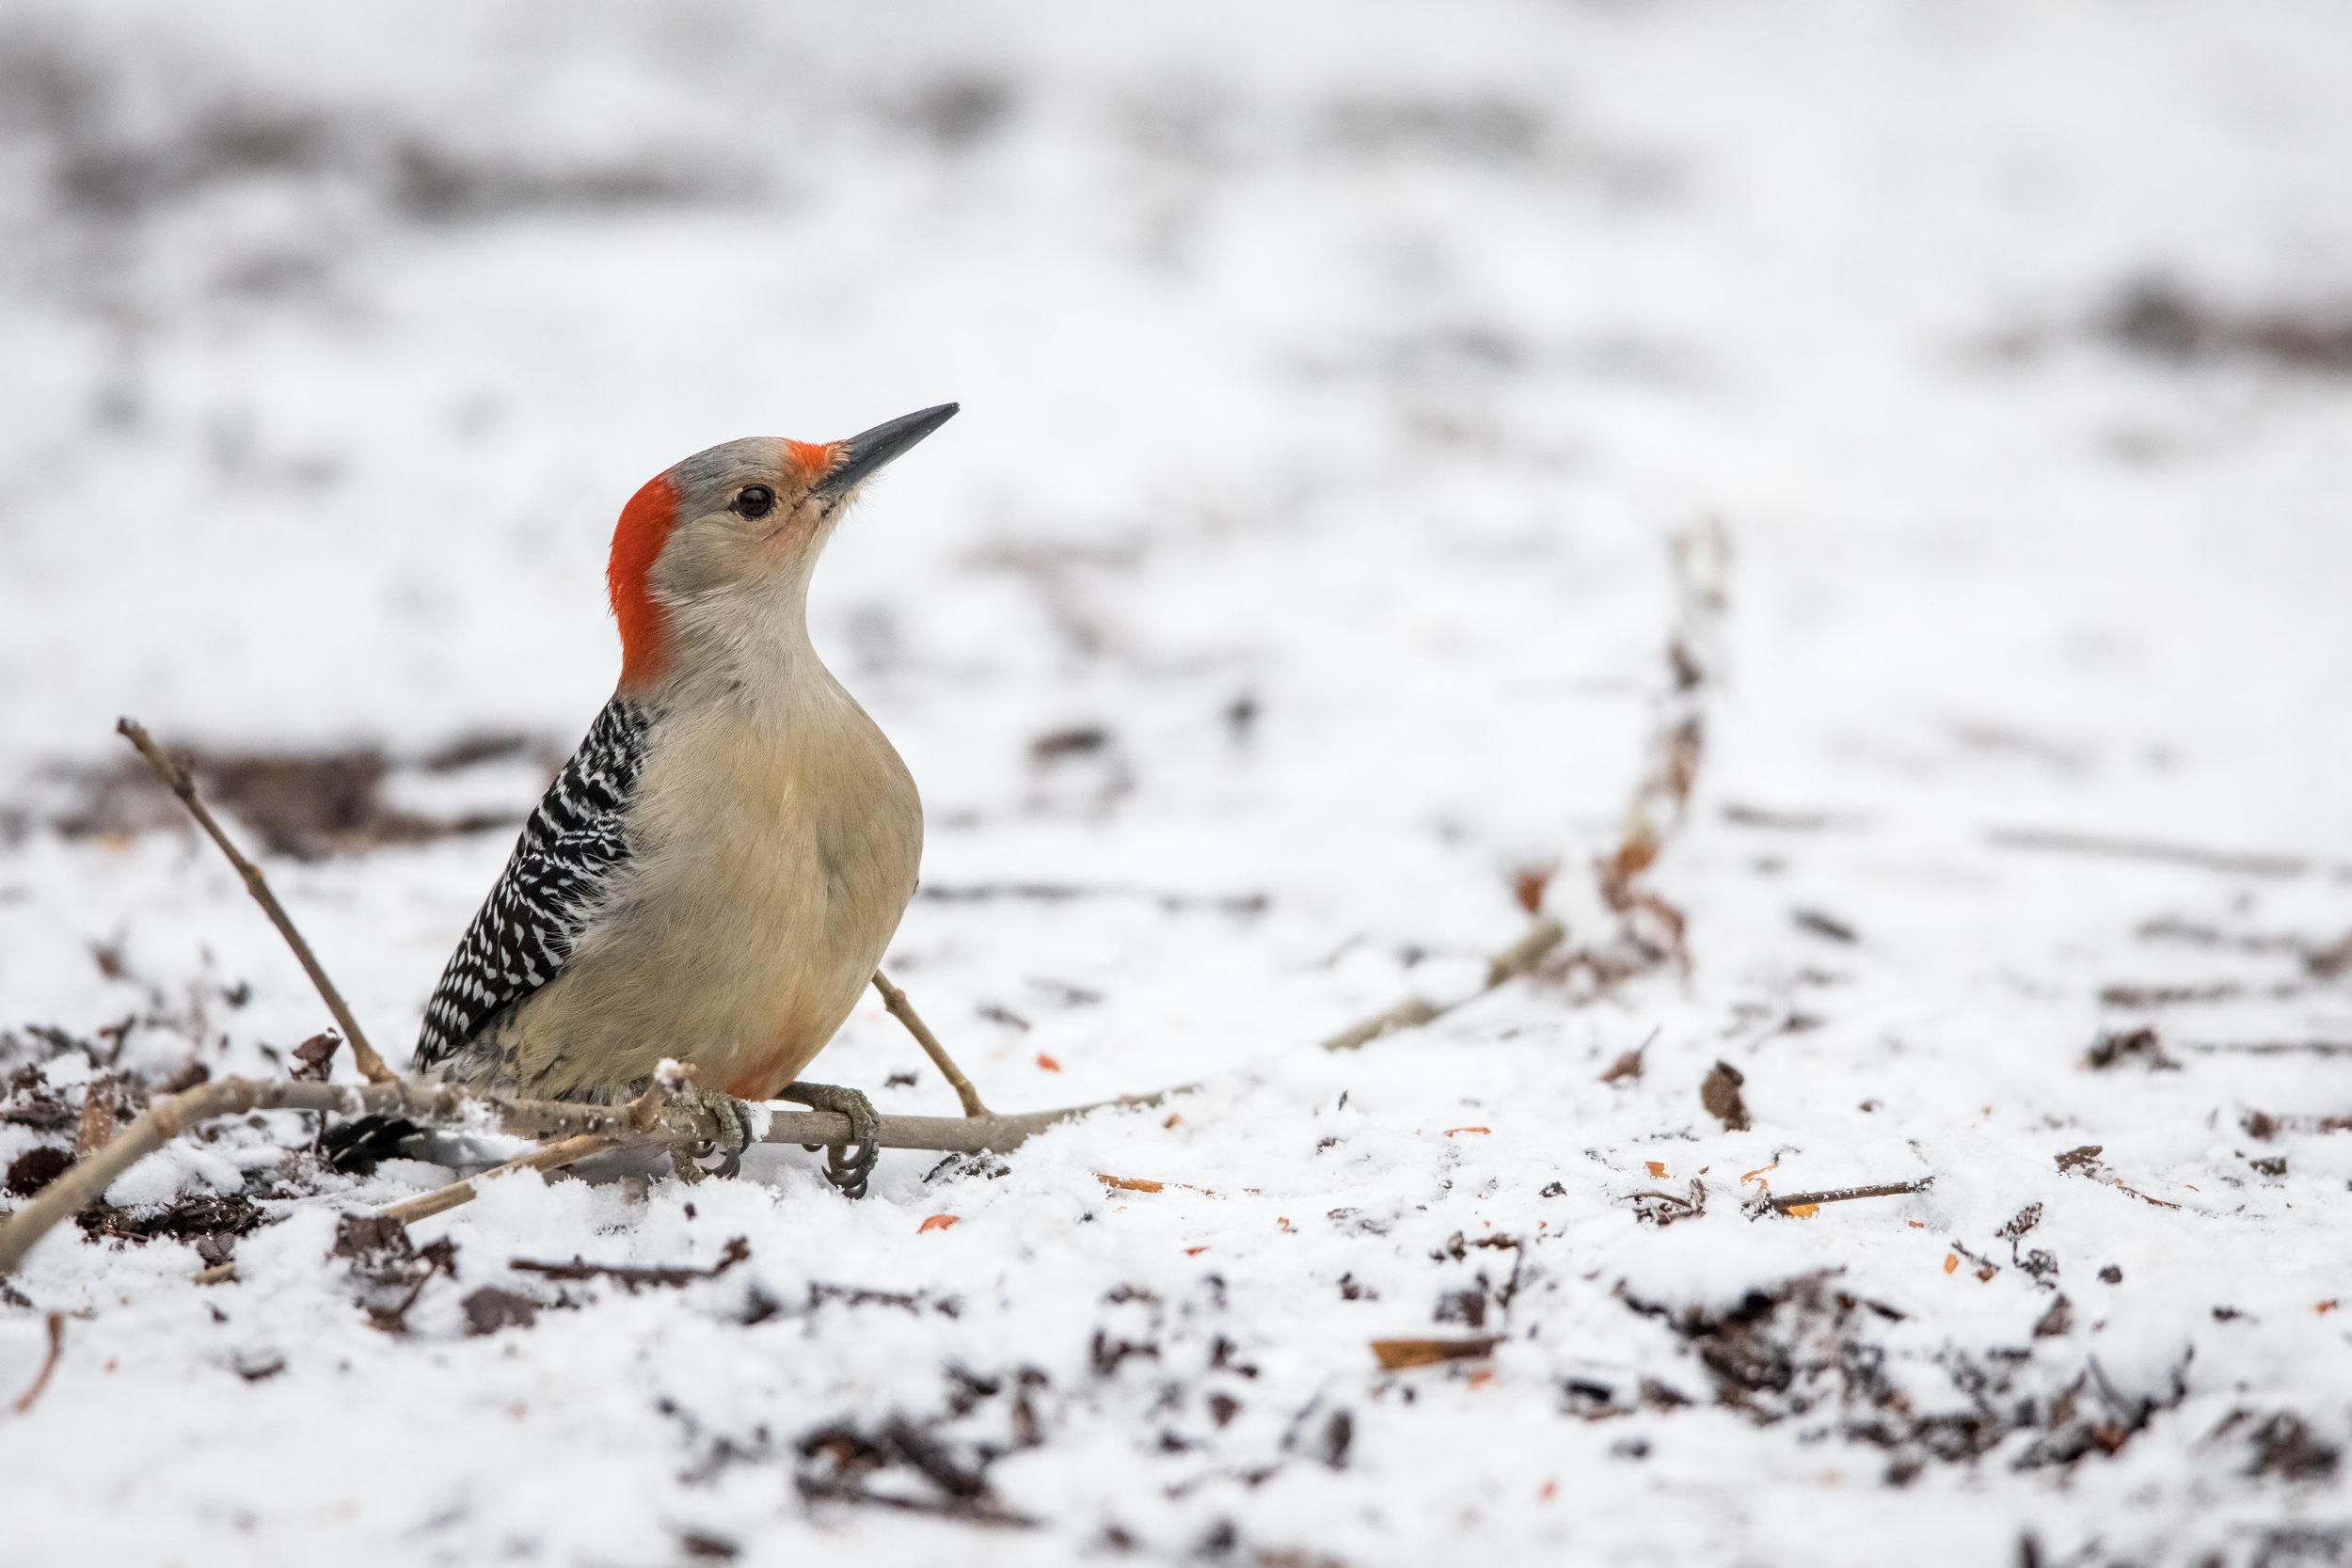 Red-Bellied Woodpecker. Photo by Jeff Goldberg -  https://www.facebook.com/jeffagoldberg  and/or Instagram at  https://www.instagram.com/always.moving .